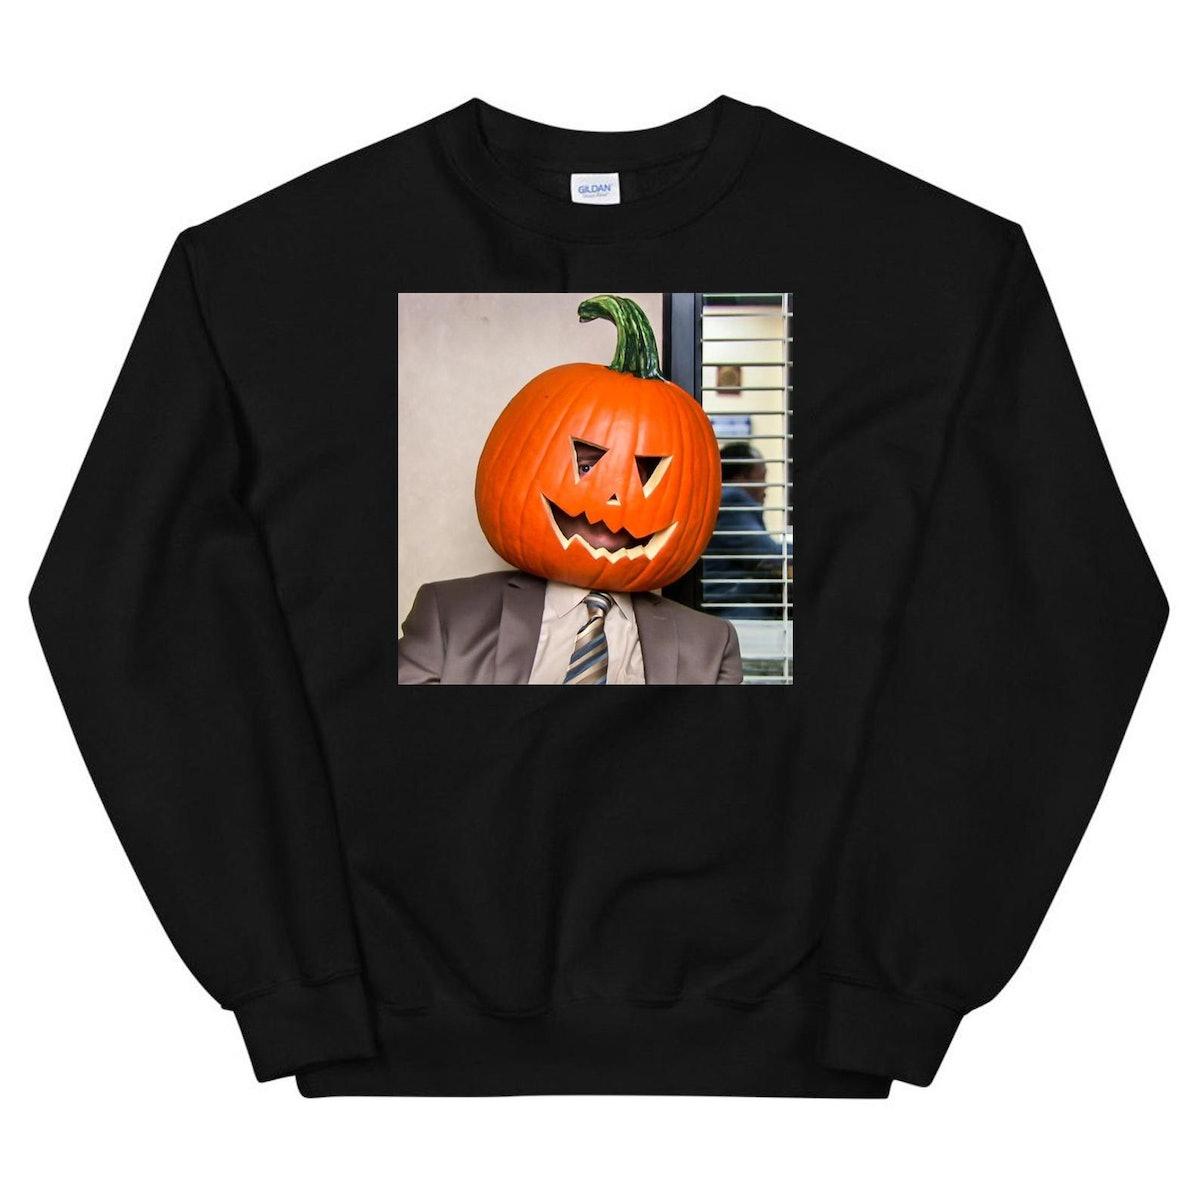 The Office Halloween Pumpkin Sweatshirt